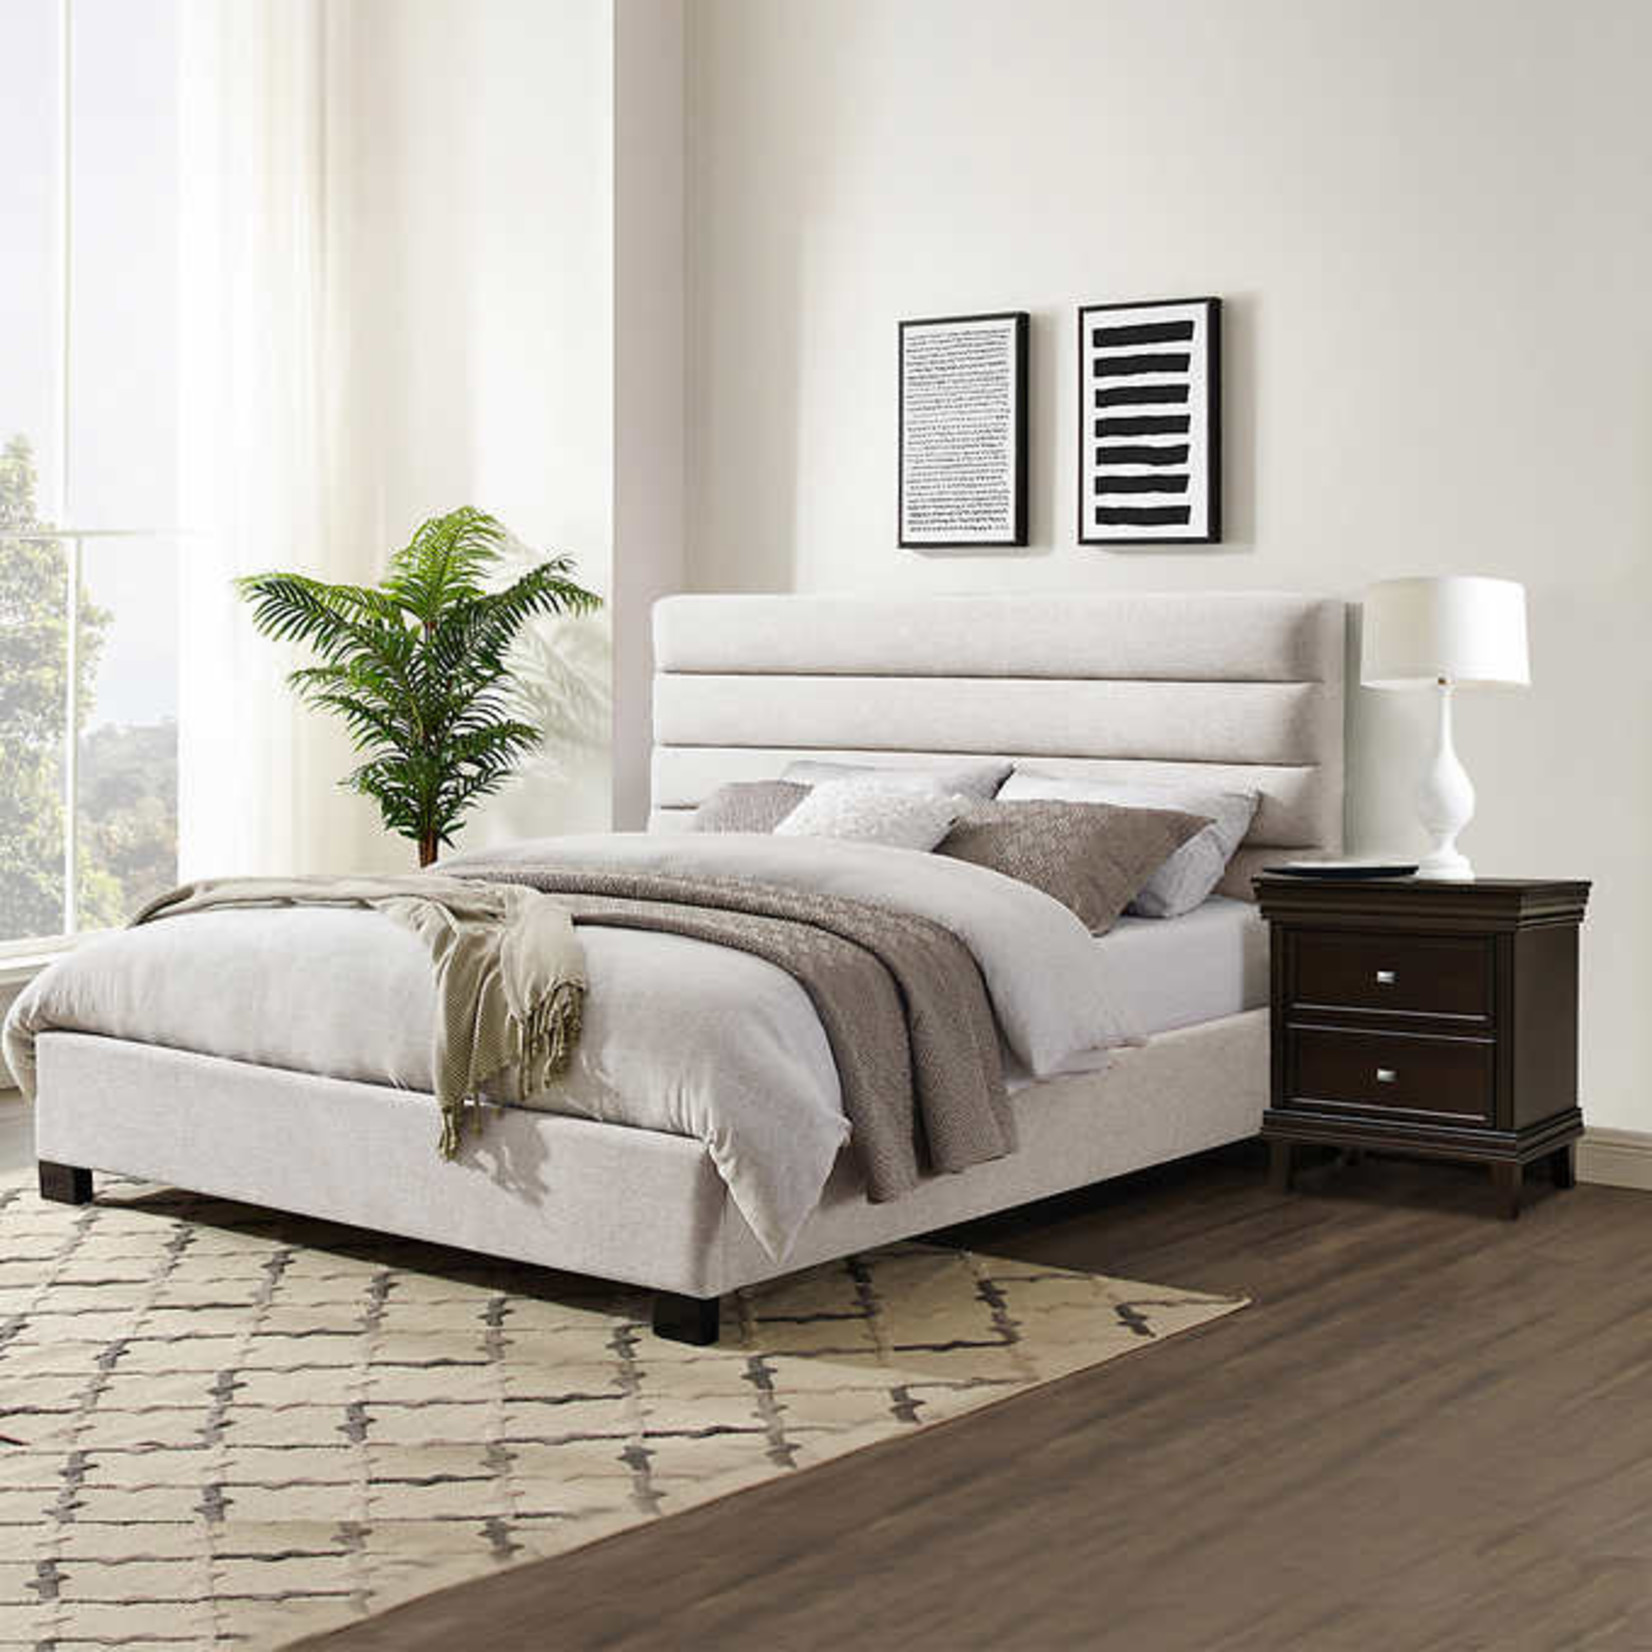 Albury Upholstered King Bed, Beige *Open box Like New